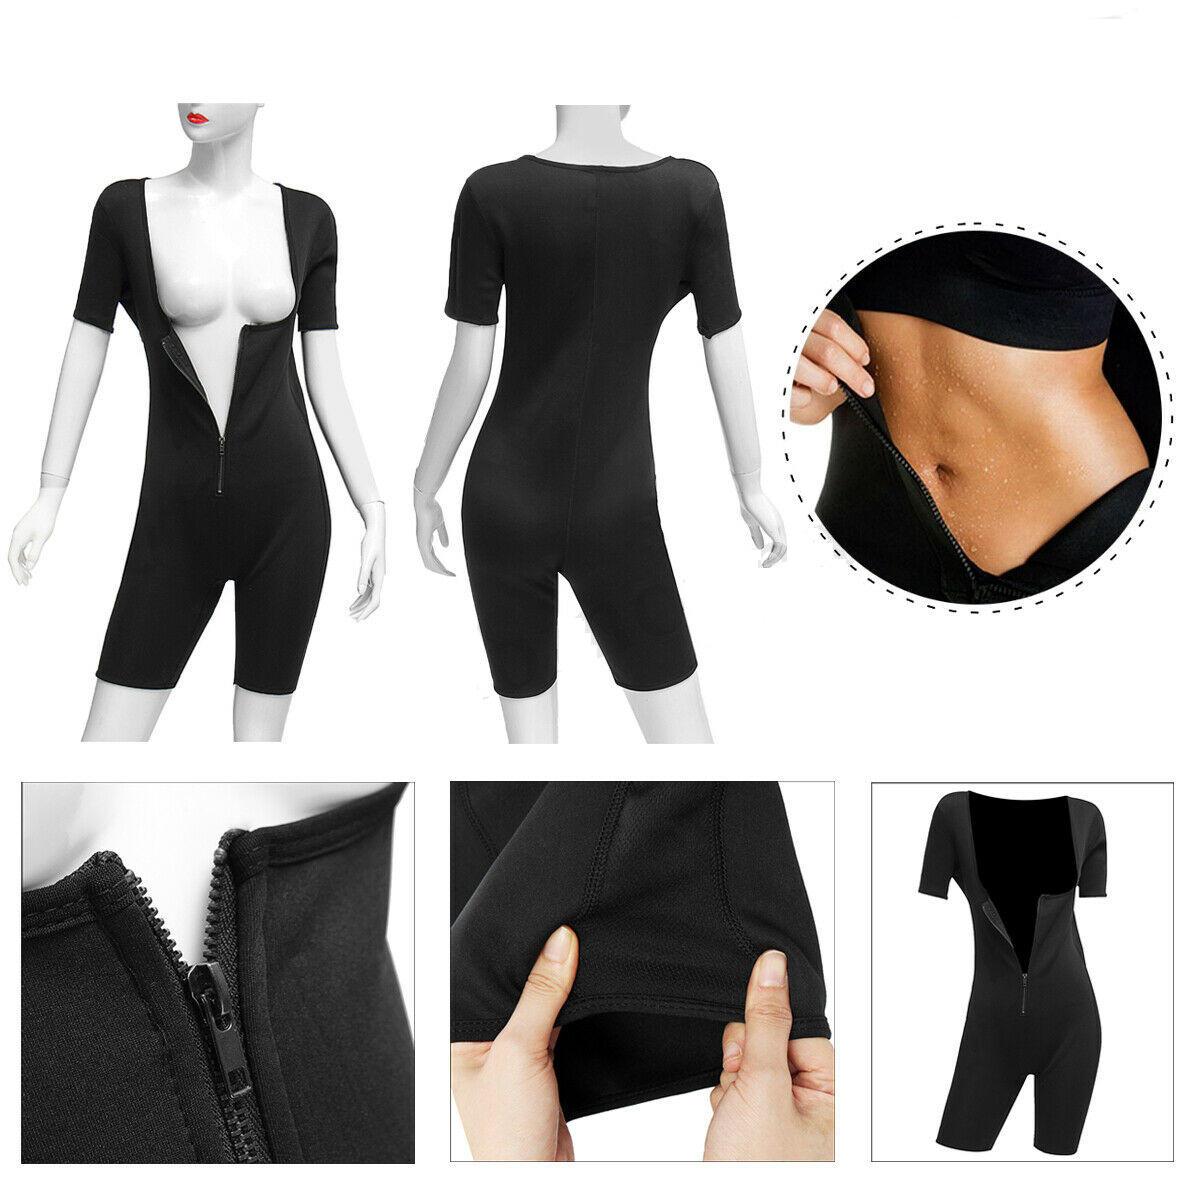 edd33cff0e7 Womens Shapewear Full Body Sweat Shaper Slimming Fitness Gym Sport Sauna  Suit Vest COD